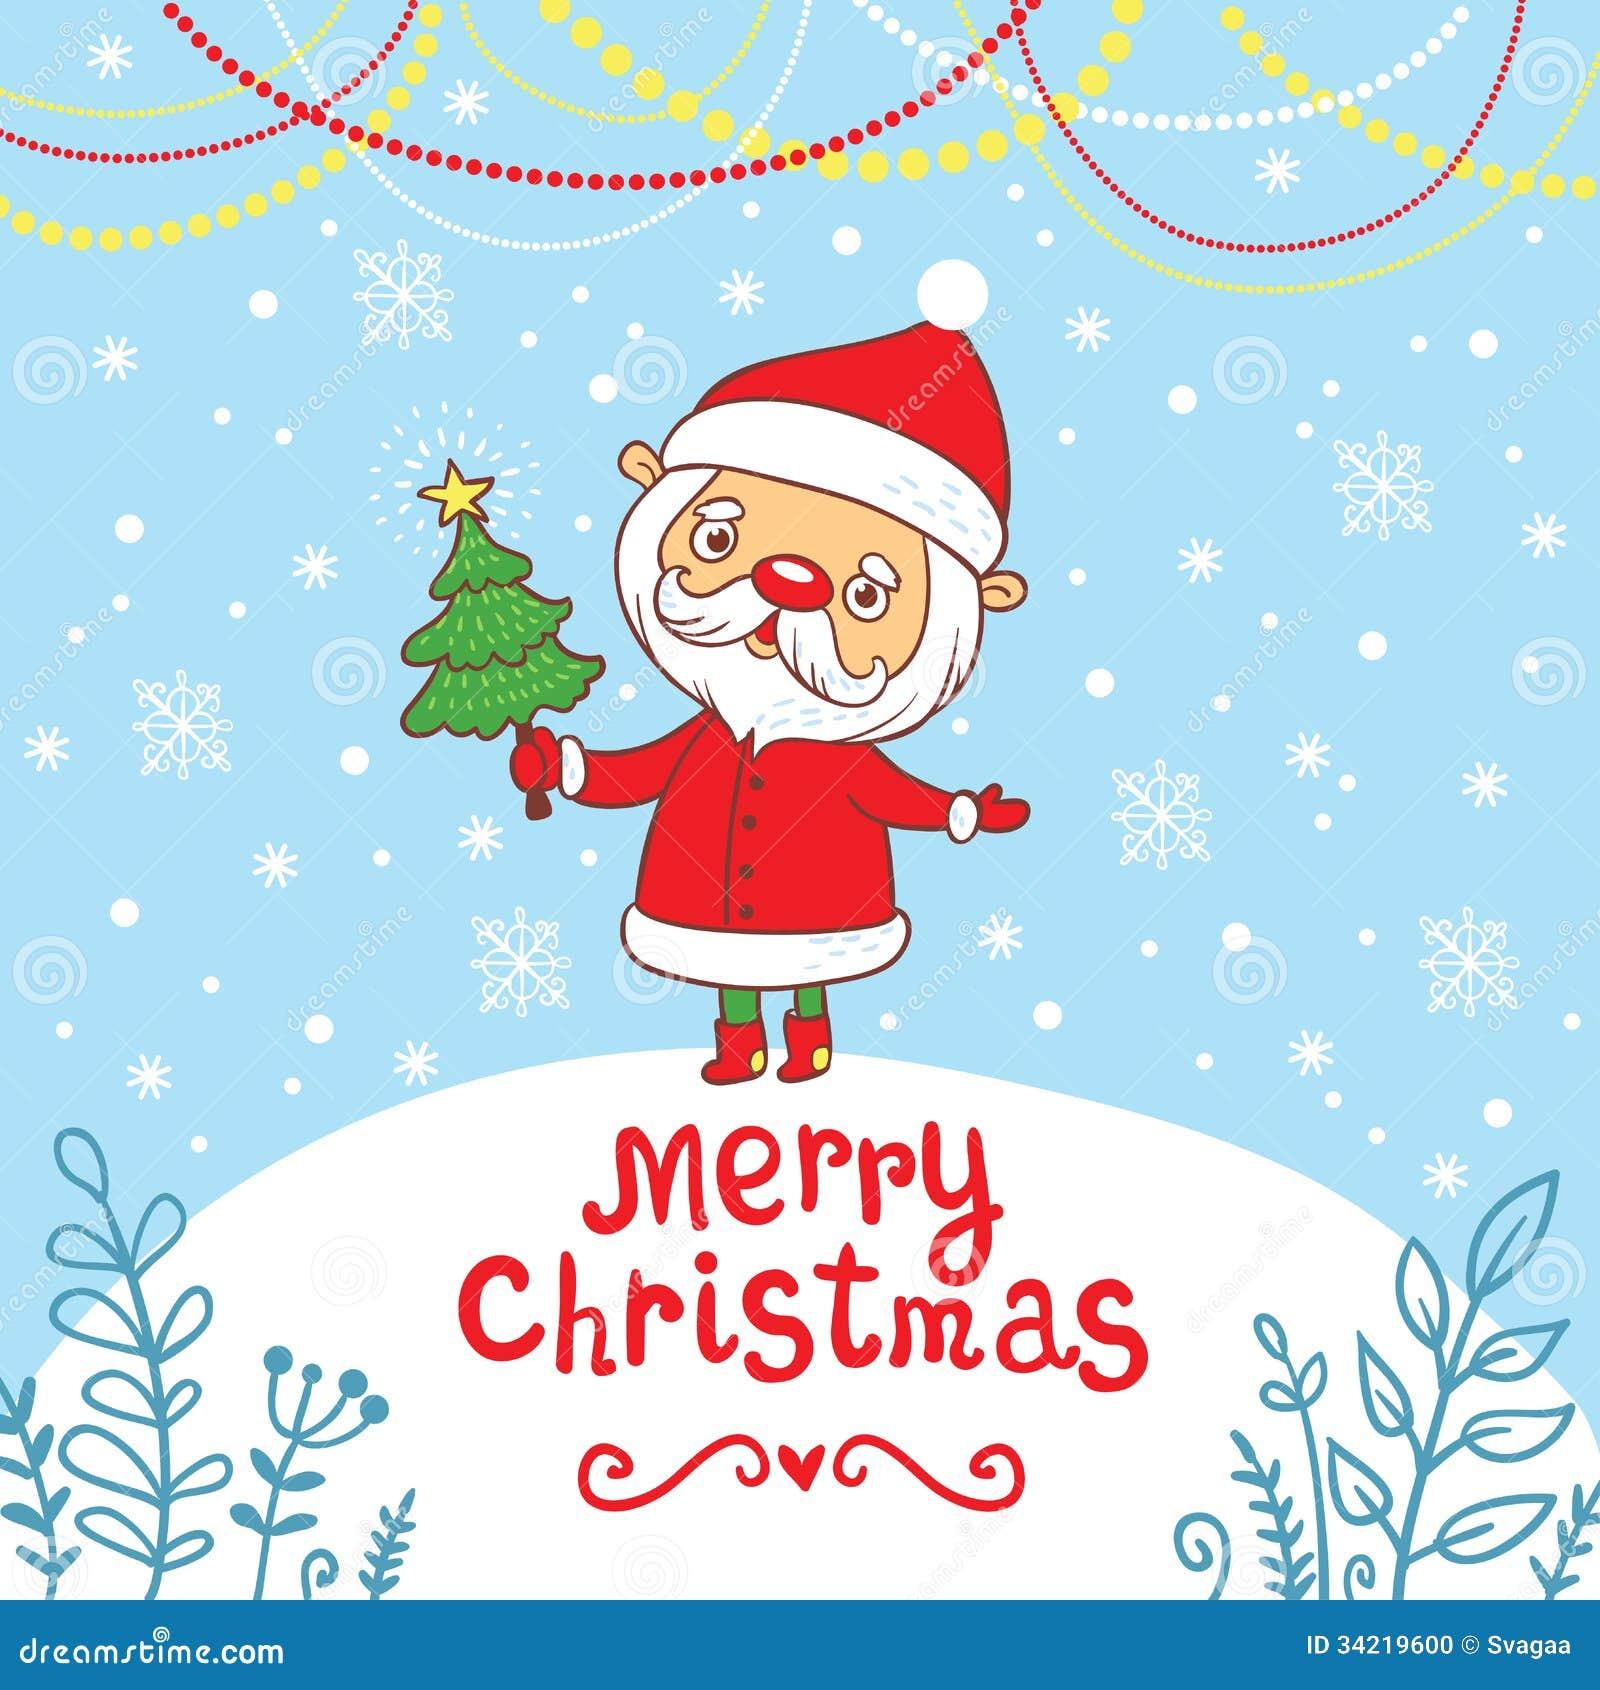 Merry christmas greeting card with cute santa stock vector merry christmas greeting card with cute santa kristyandbryce Image collections